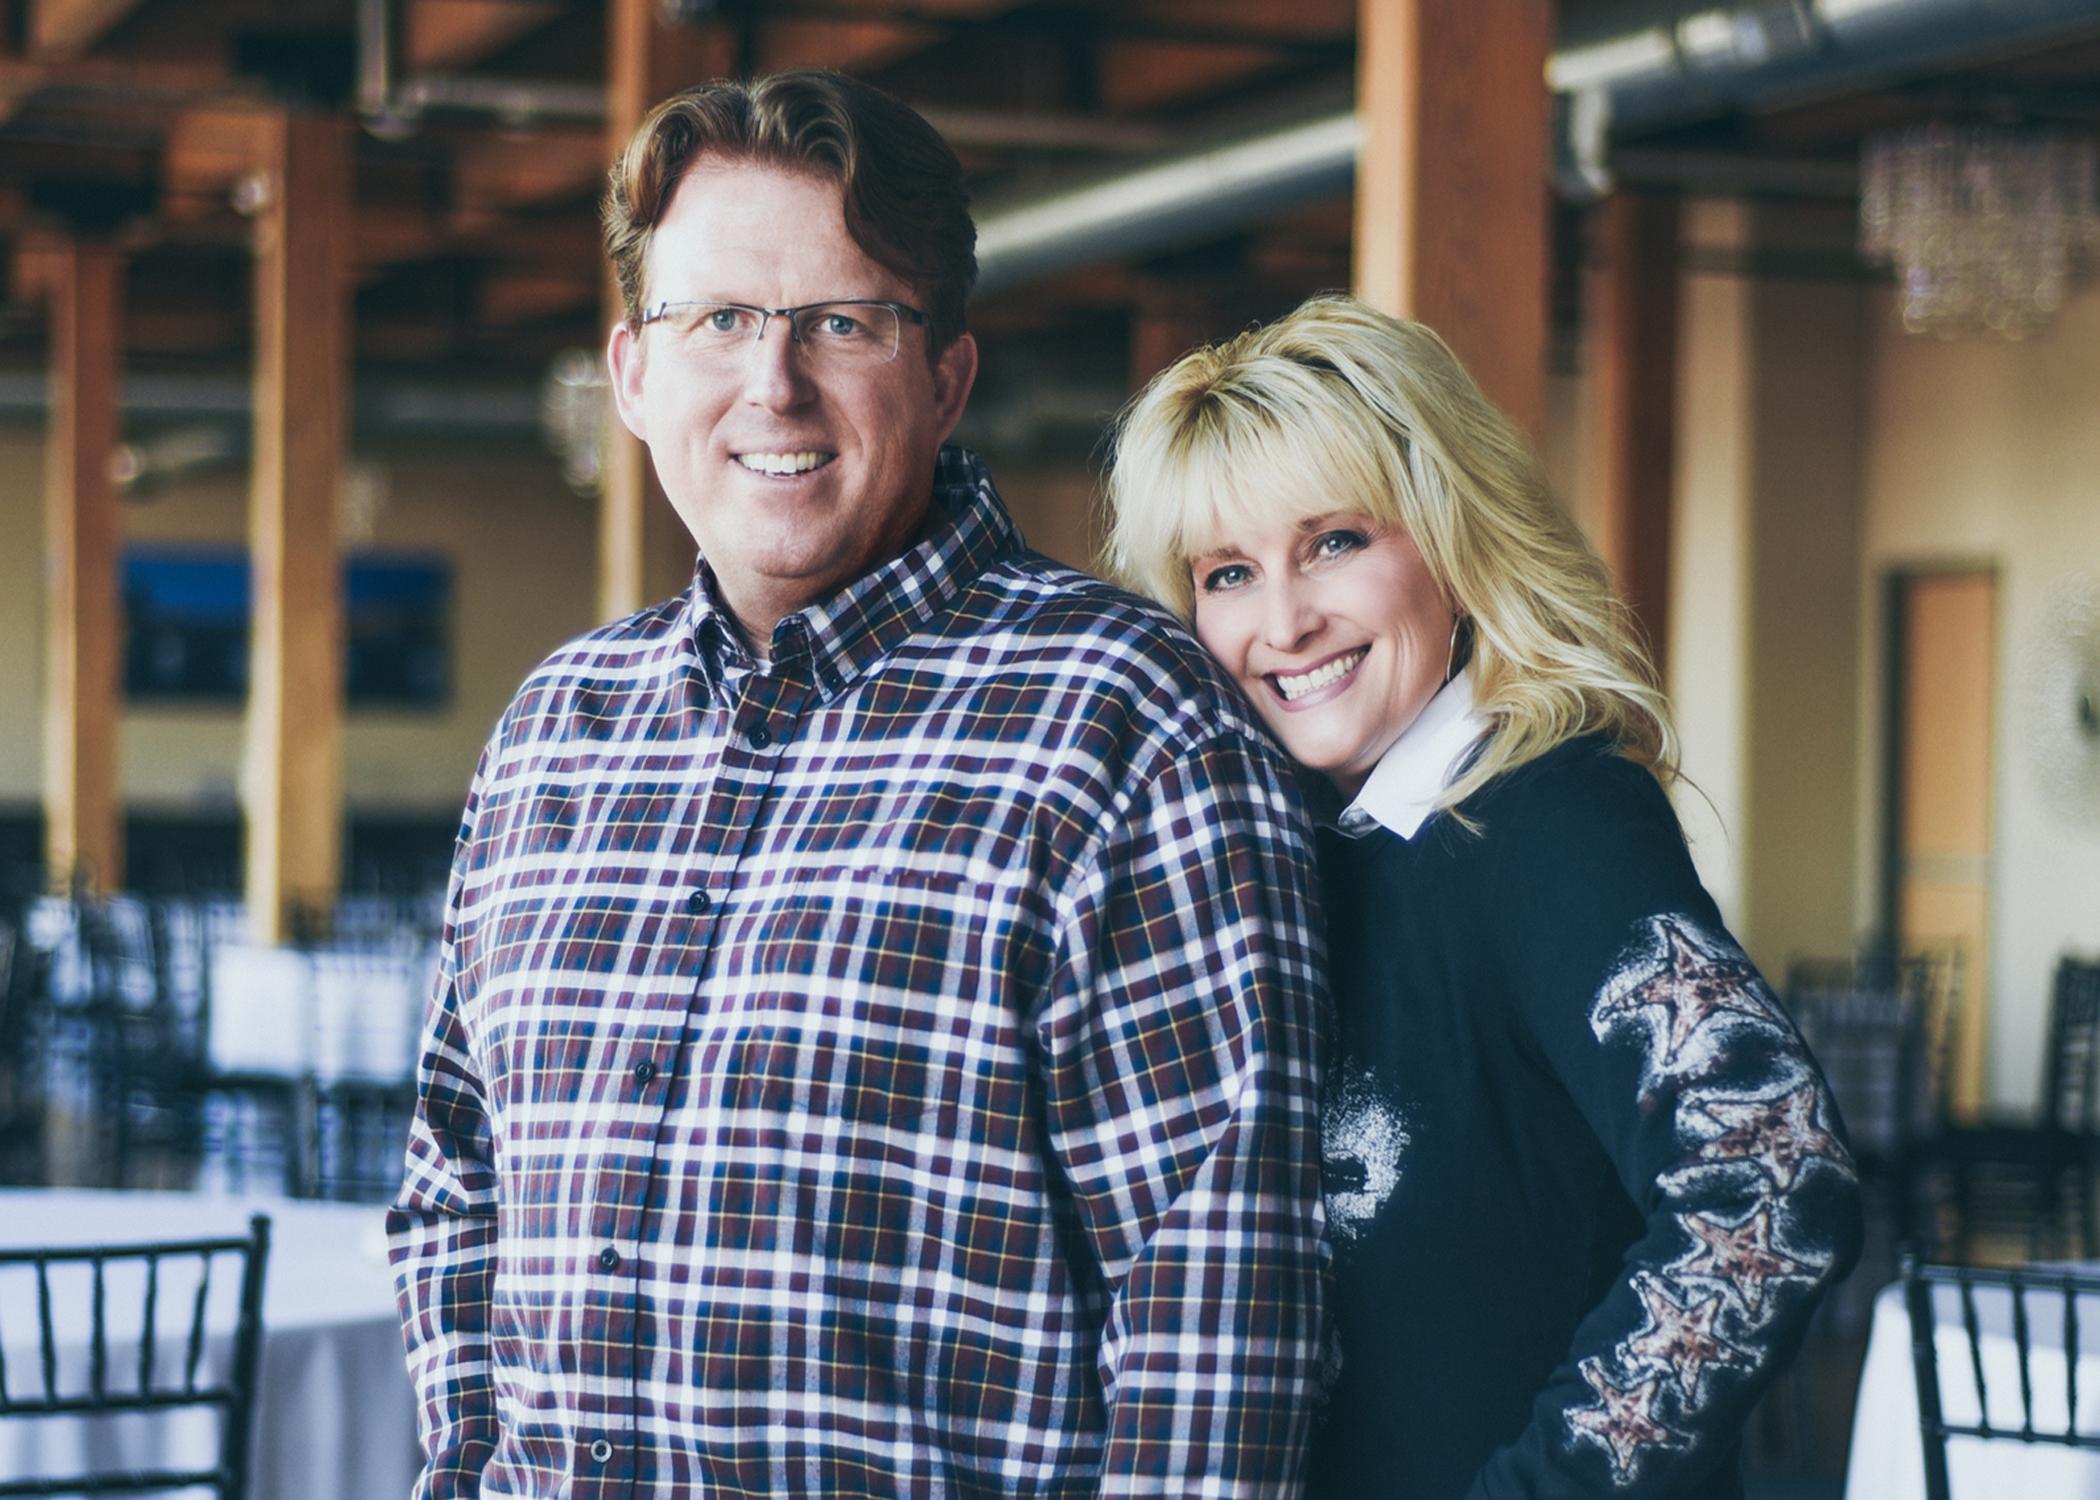 Dan and Andrea Deward in a casual pose in their loft wedding venue